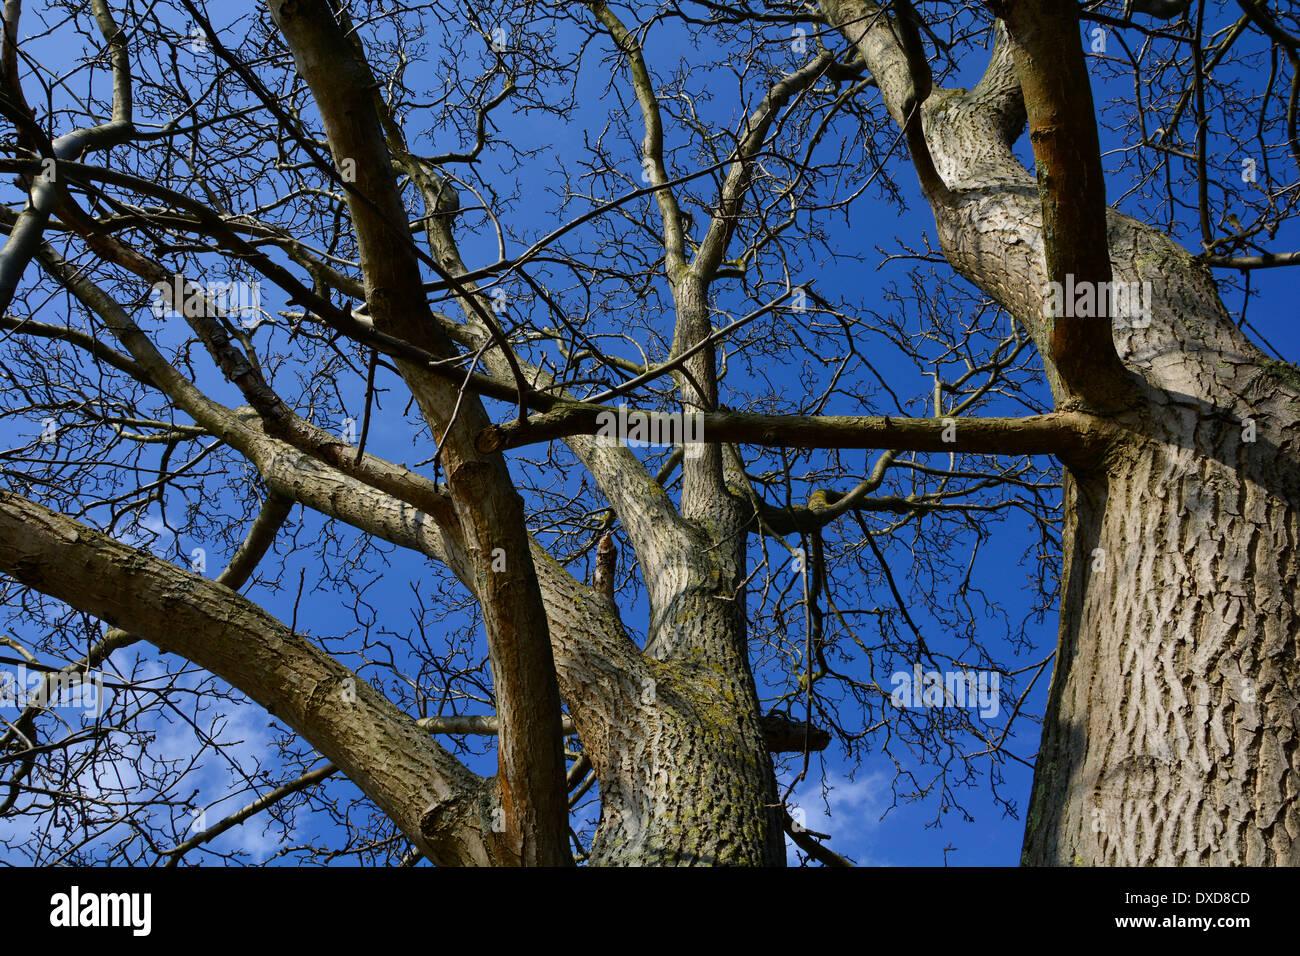 Big old tree trunk with branches and blue sky without leaves Germany Großer alter Baumstamm mit Zweigen Ästen bei blauem Himmel Stock Photo